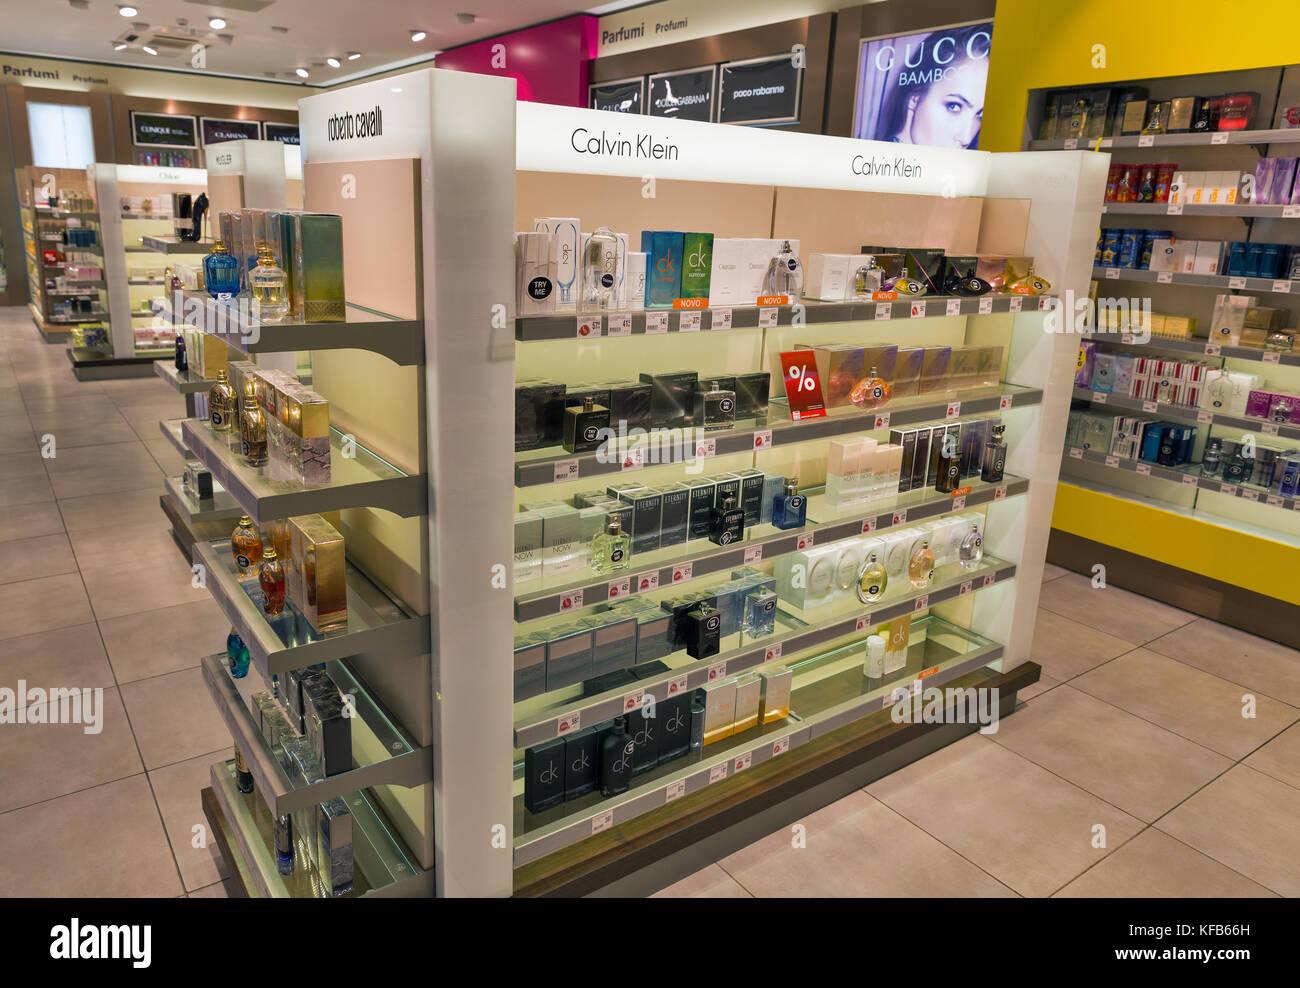 SKOFIJE, SLOVENIA - SEPTEMBER 21, 2017: Calvin Klein and Roberto Cavalli parfumery store shelf in Travel Free bordershop. It is a highway retail outle Stock Photo